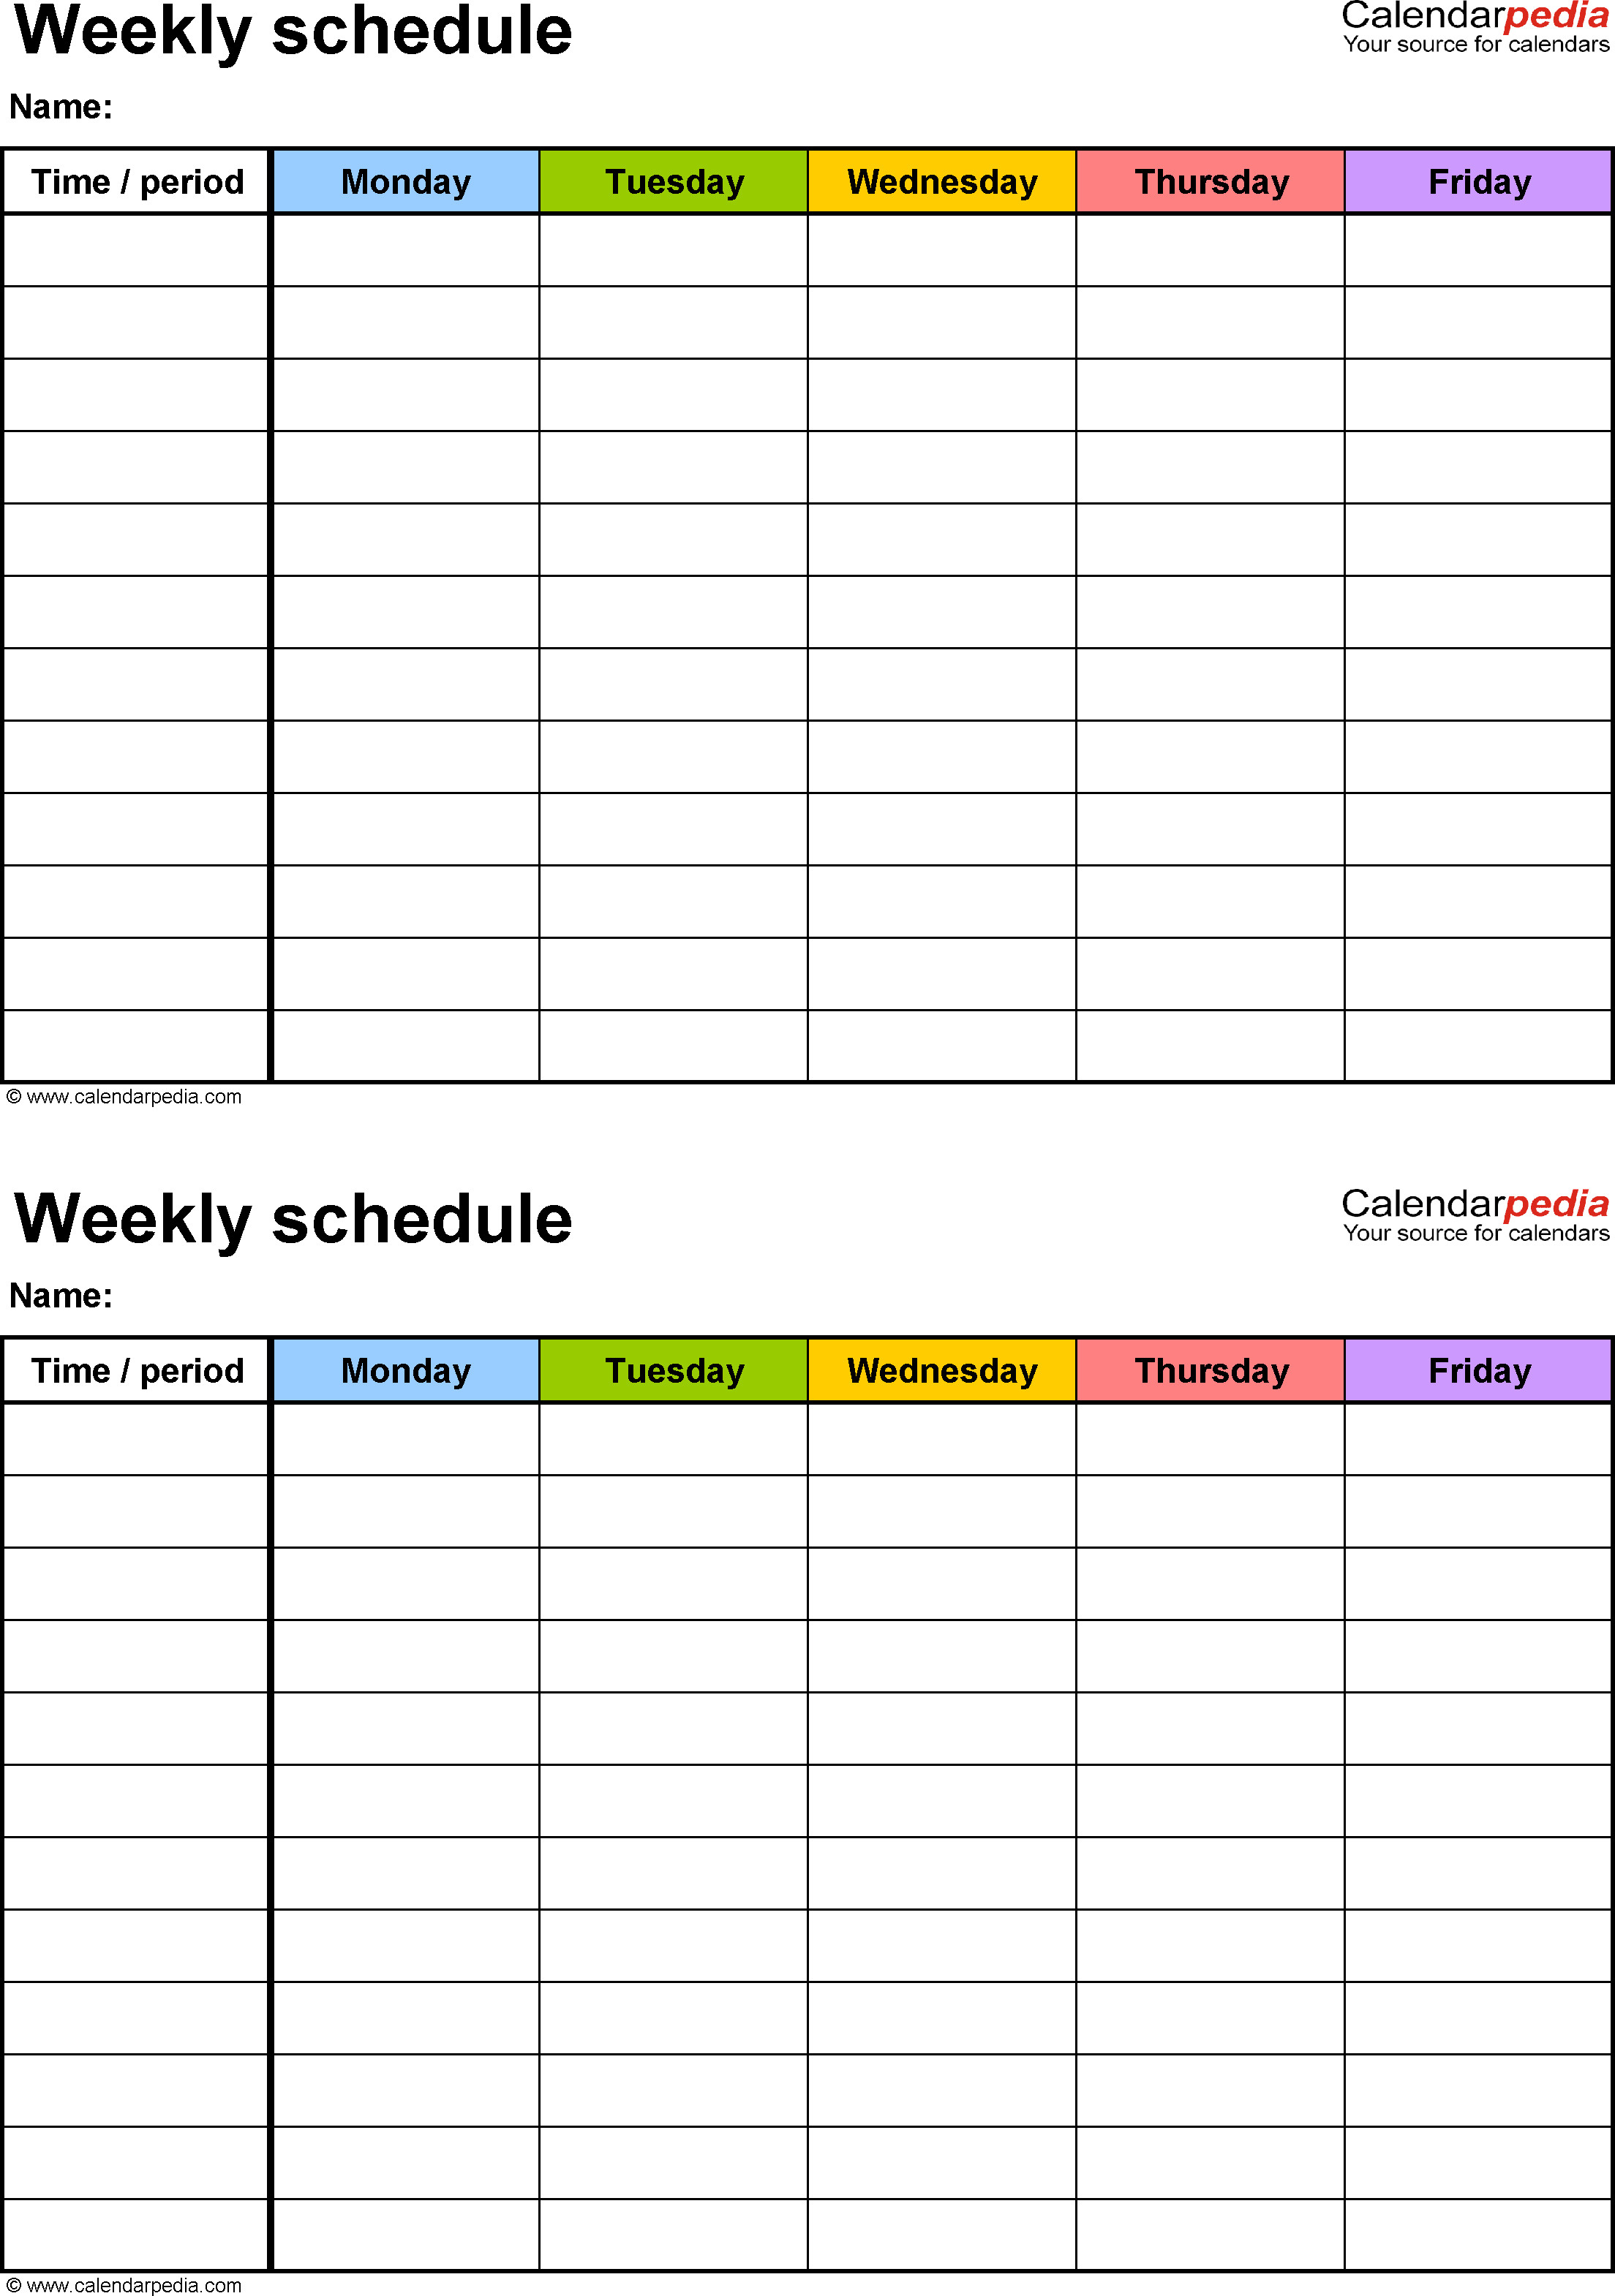 Weekly School Planner Template Weekly Schedule Template for Excel Version 3 2 Schedules